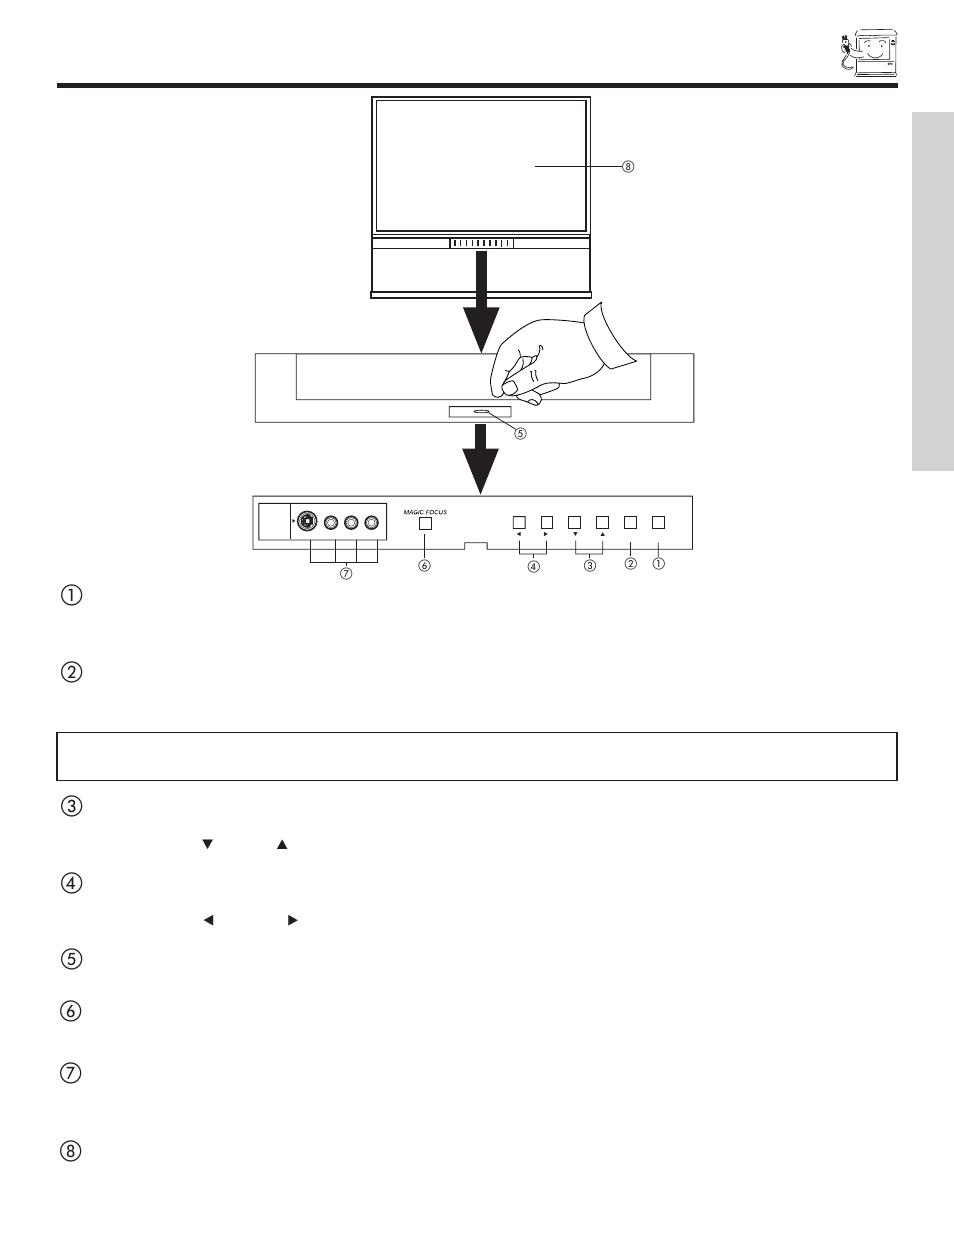 front panel controls first time use hitachi 51f500 user manual rh manualsdir com Hitachi TV Repair Manual Hitachi TV Service Manual